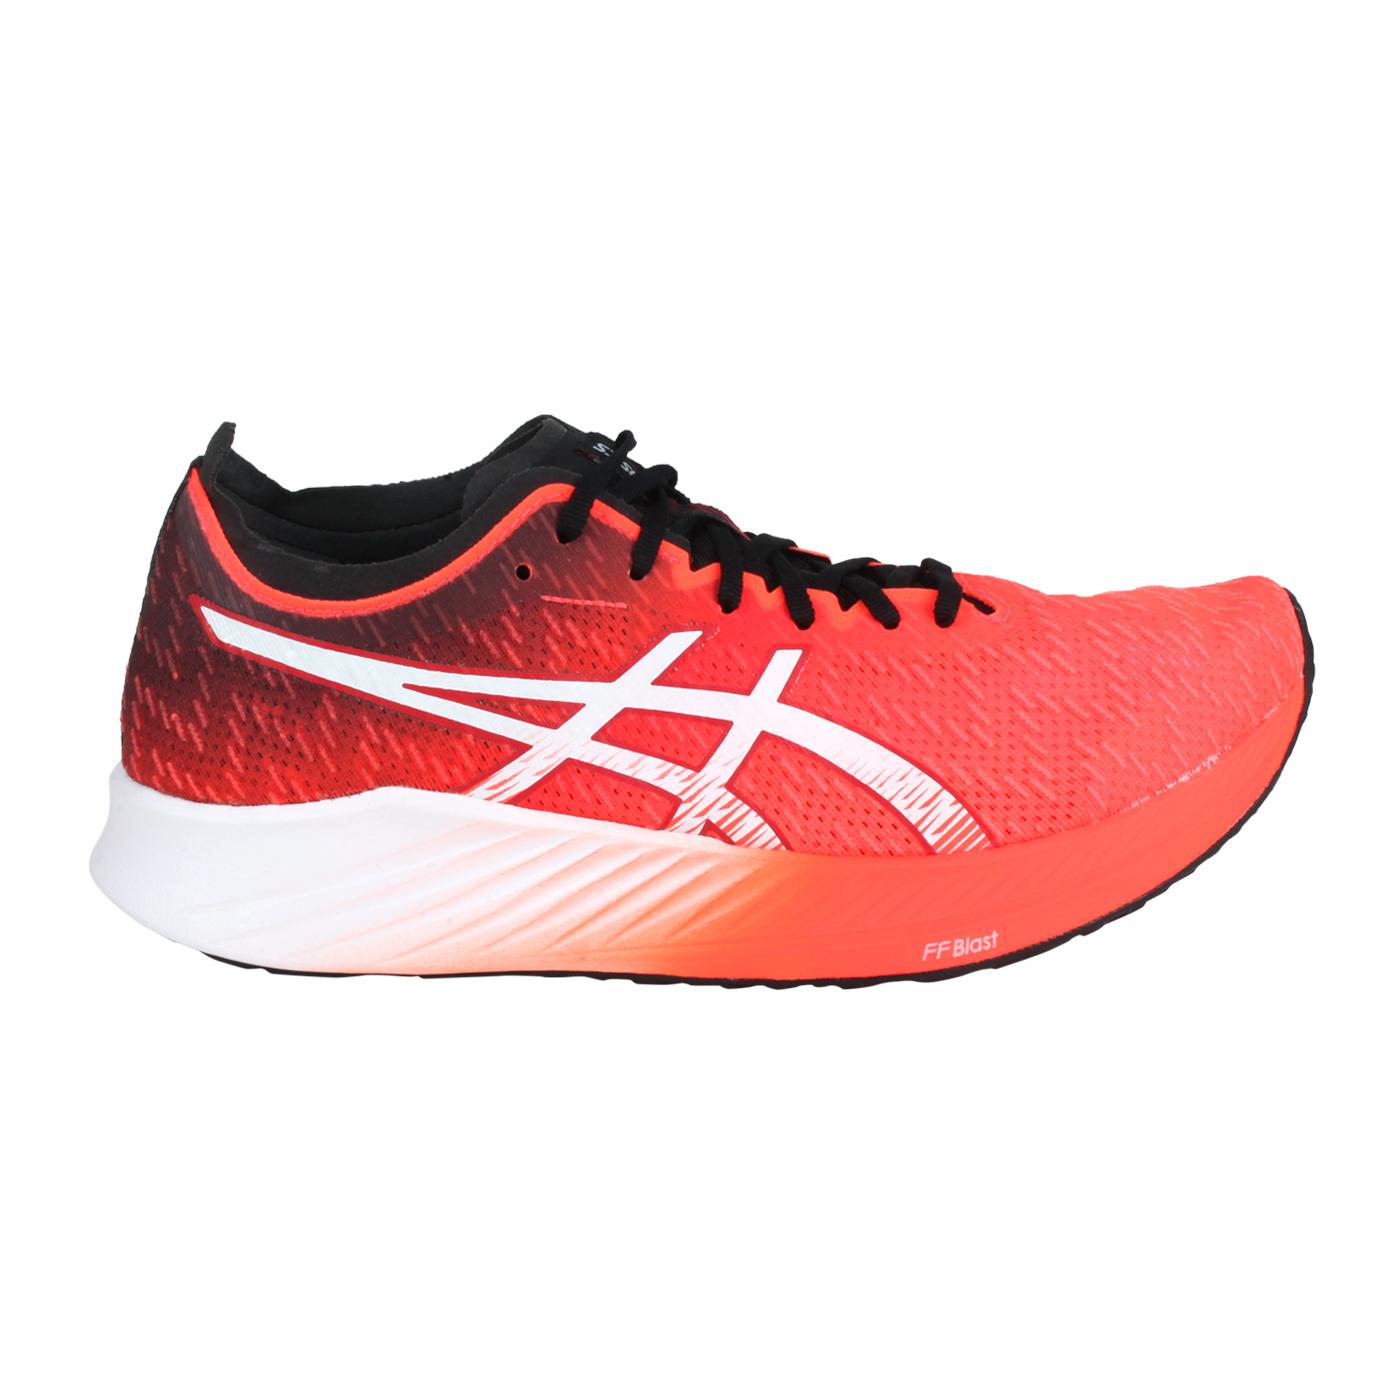 ASICS 限量-女款路跑鞋  @MAGIC SPEED@1012A895-600 - 螢光橘紅白